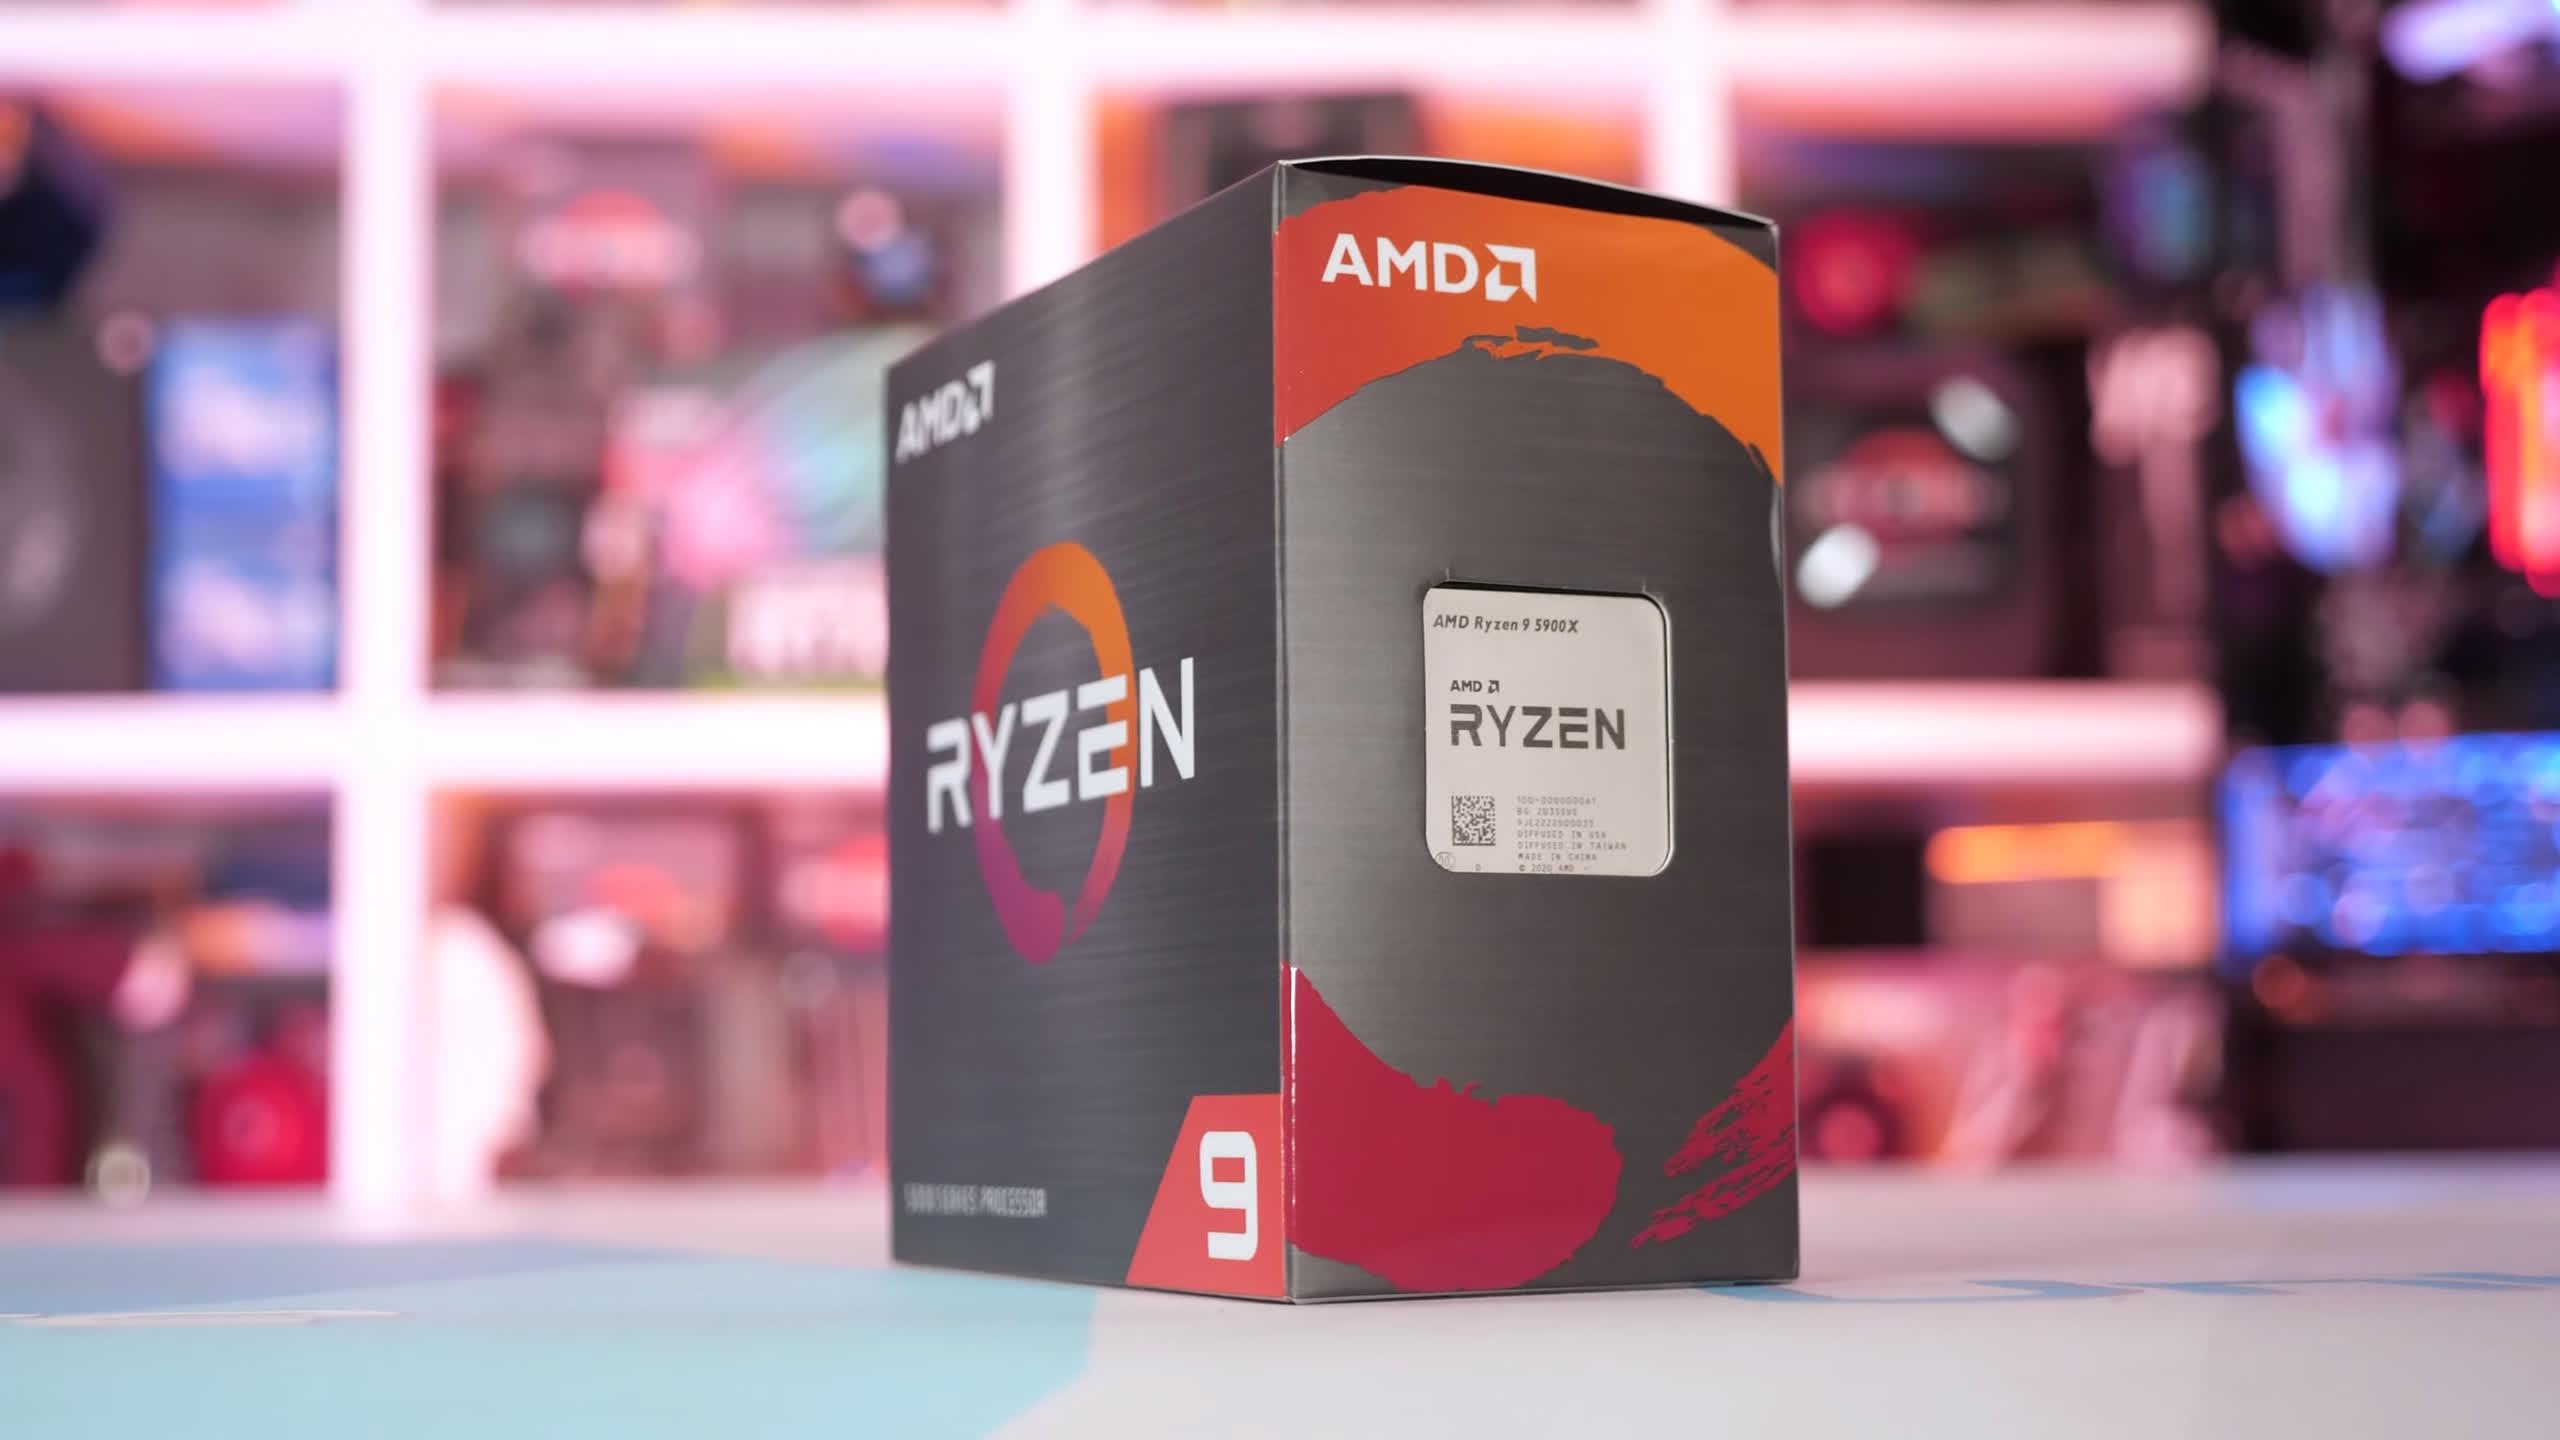 It will not offer AMD Ryzen 5000 B2 review processors